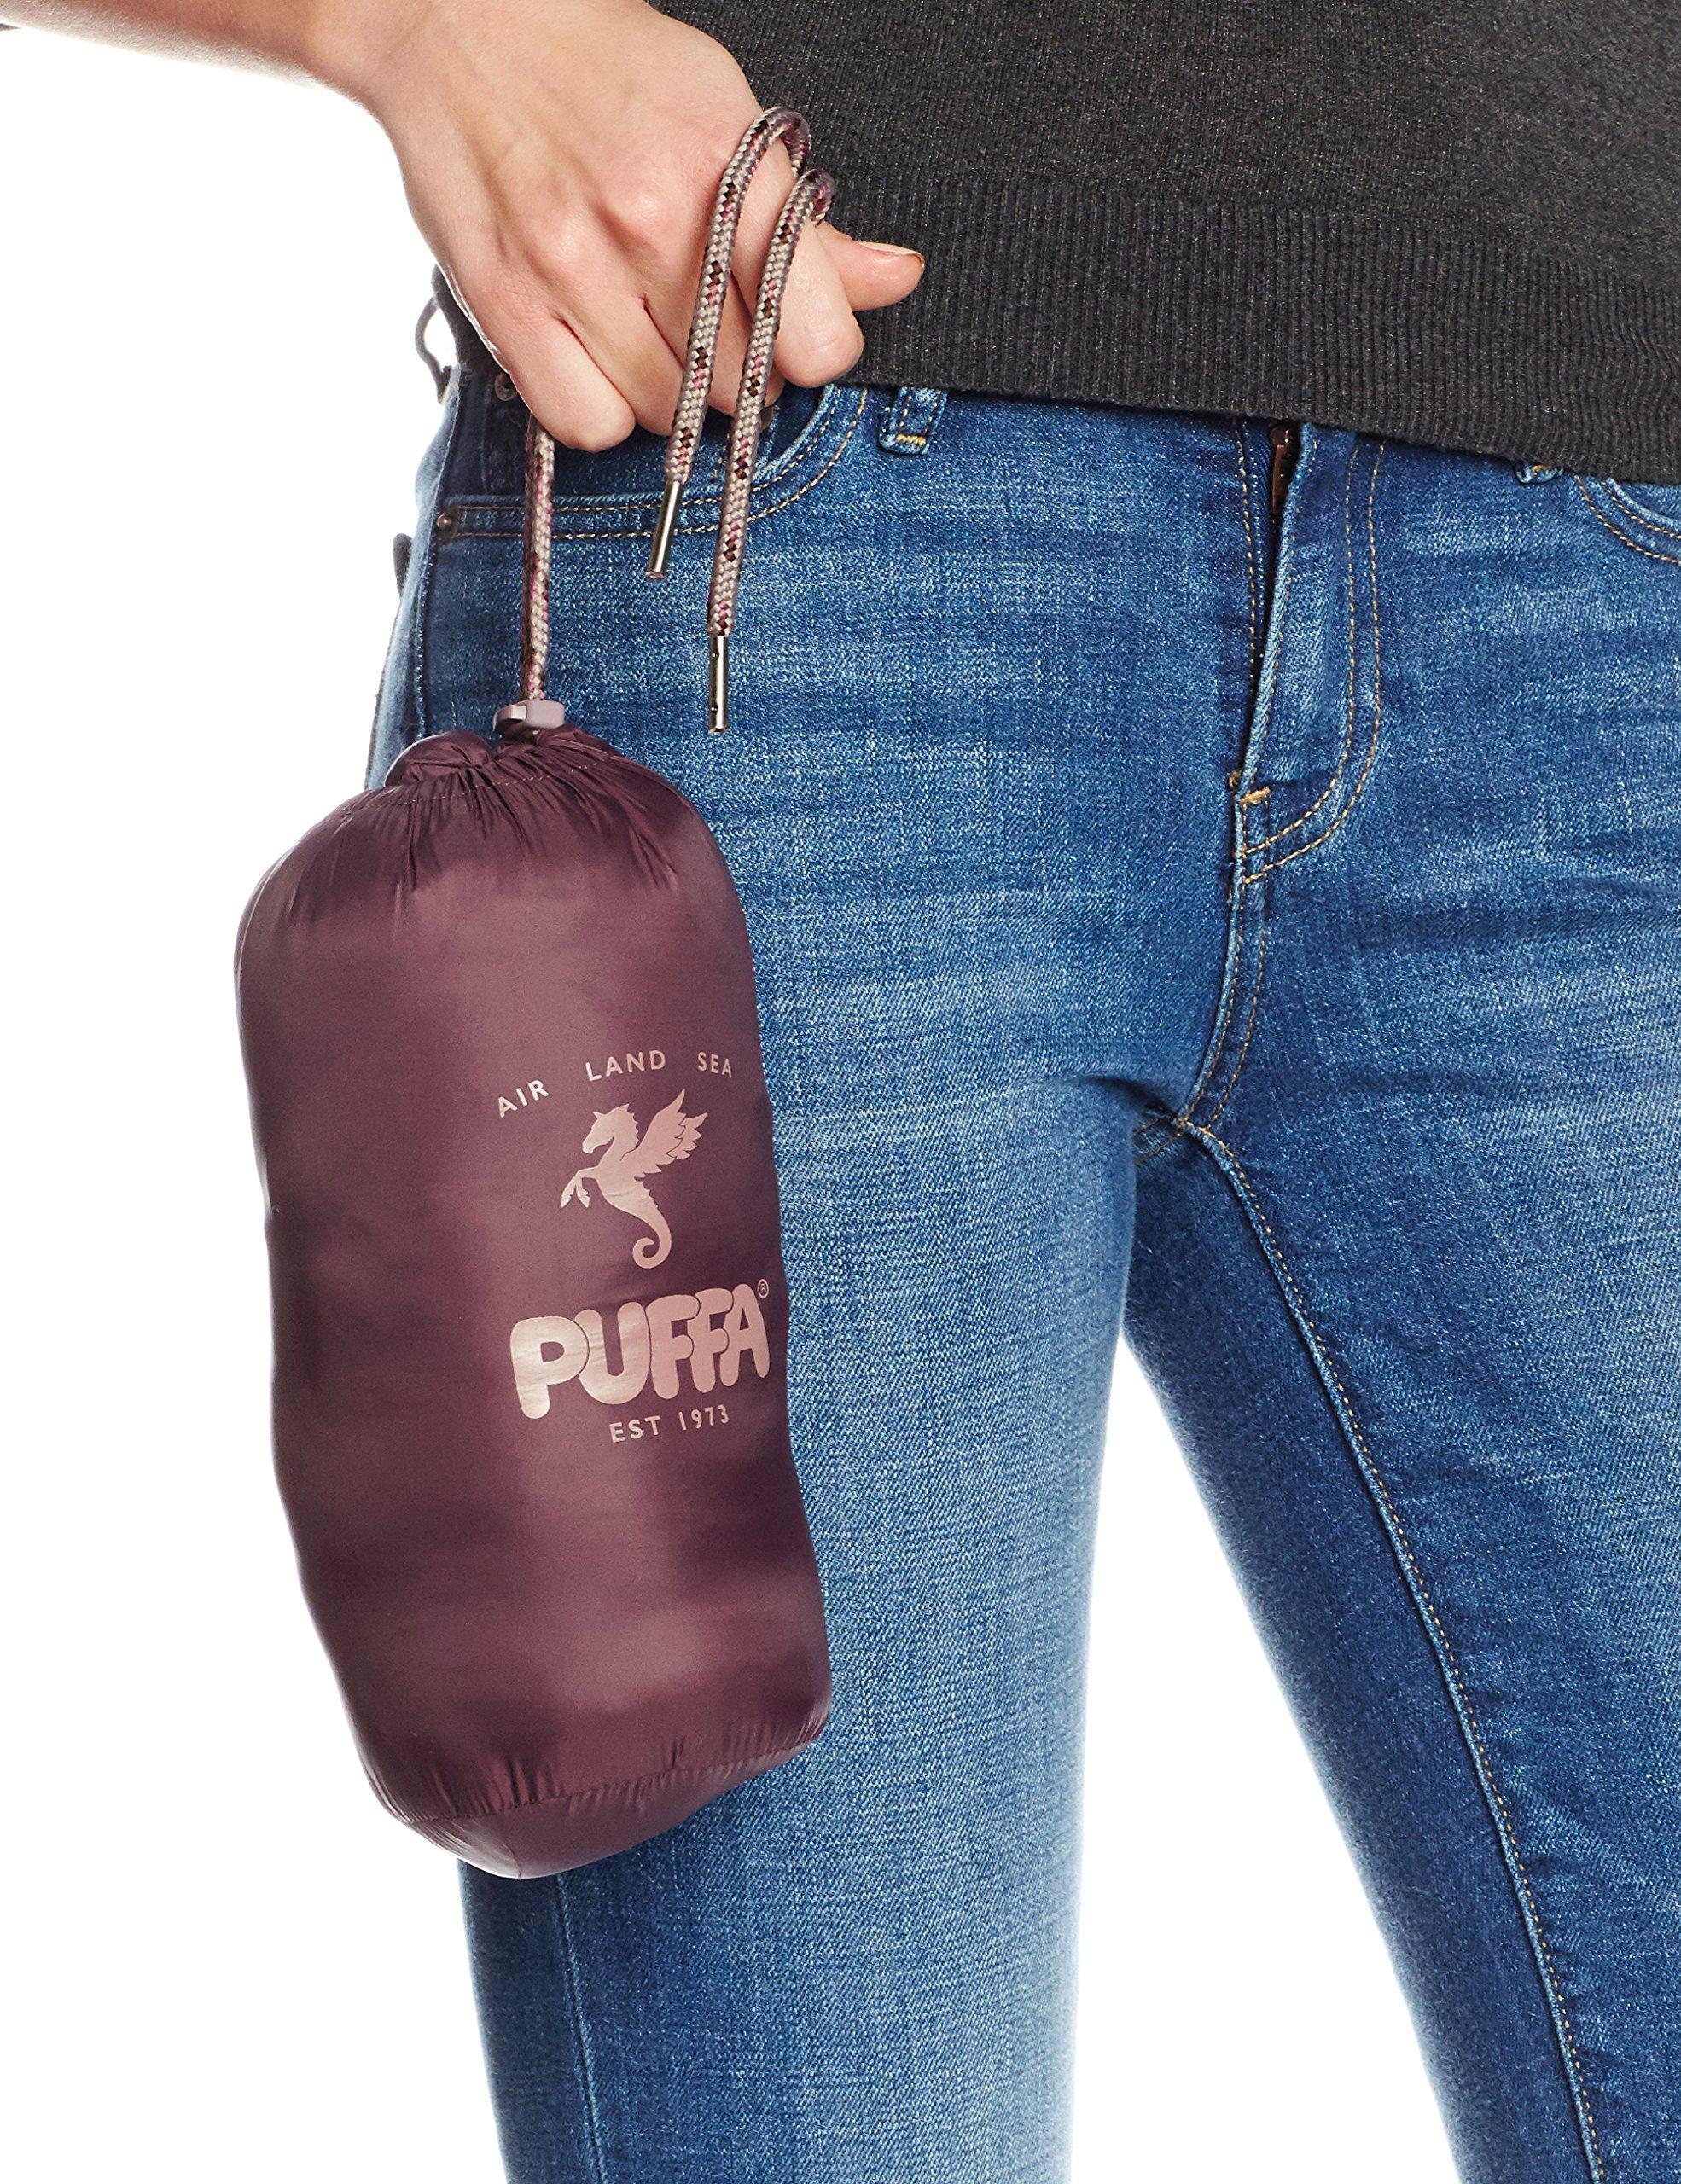 A16W%2B7eKARL - Puffa Women's King Sports Sleeveless Gilet